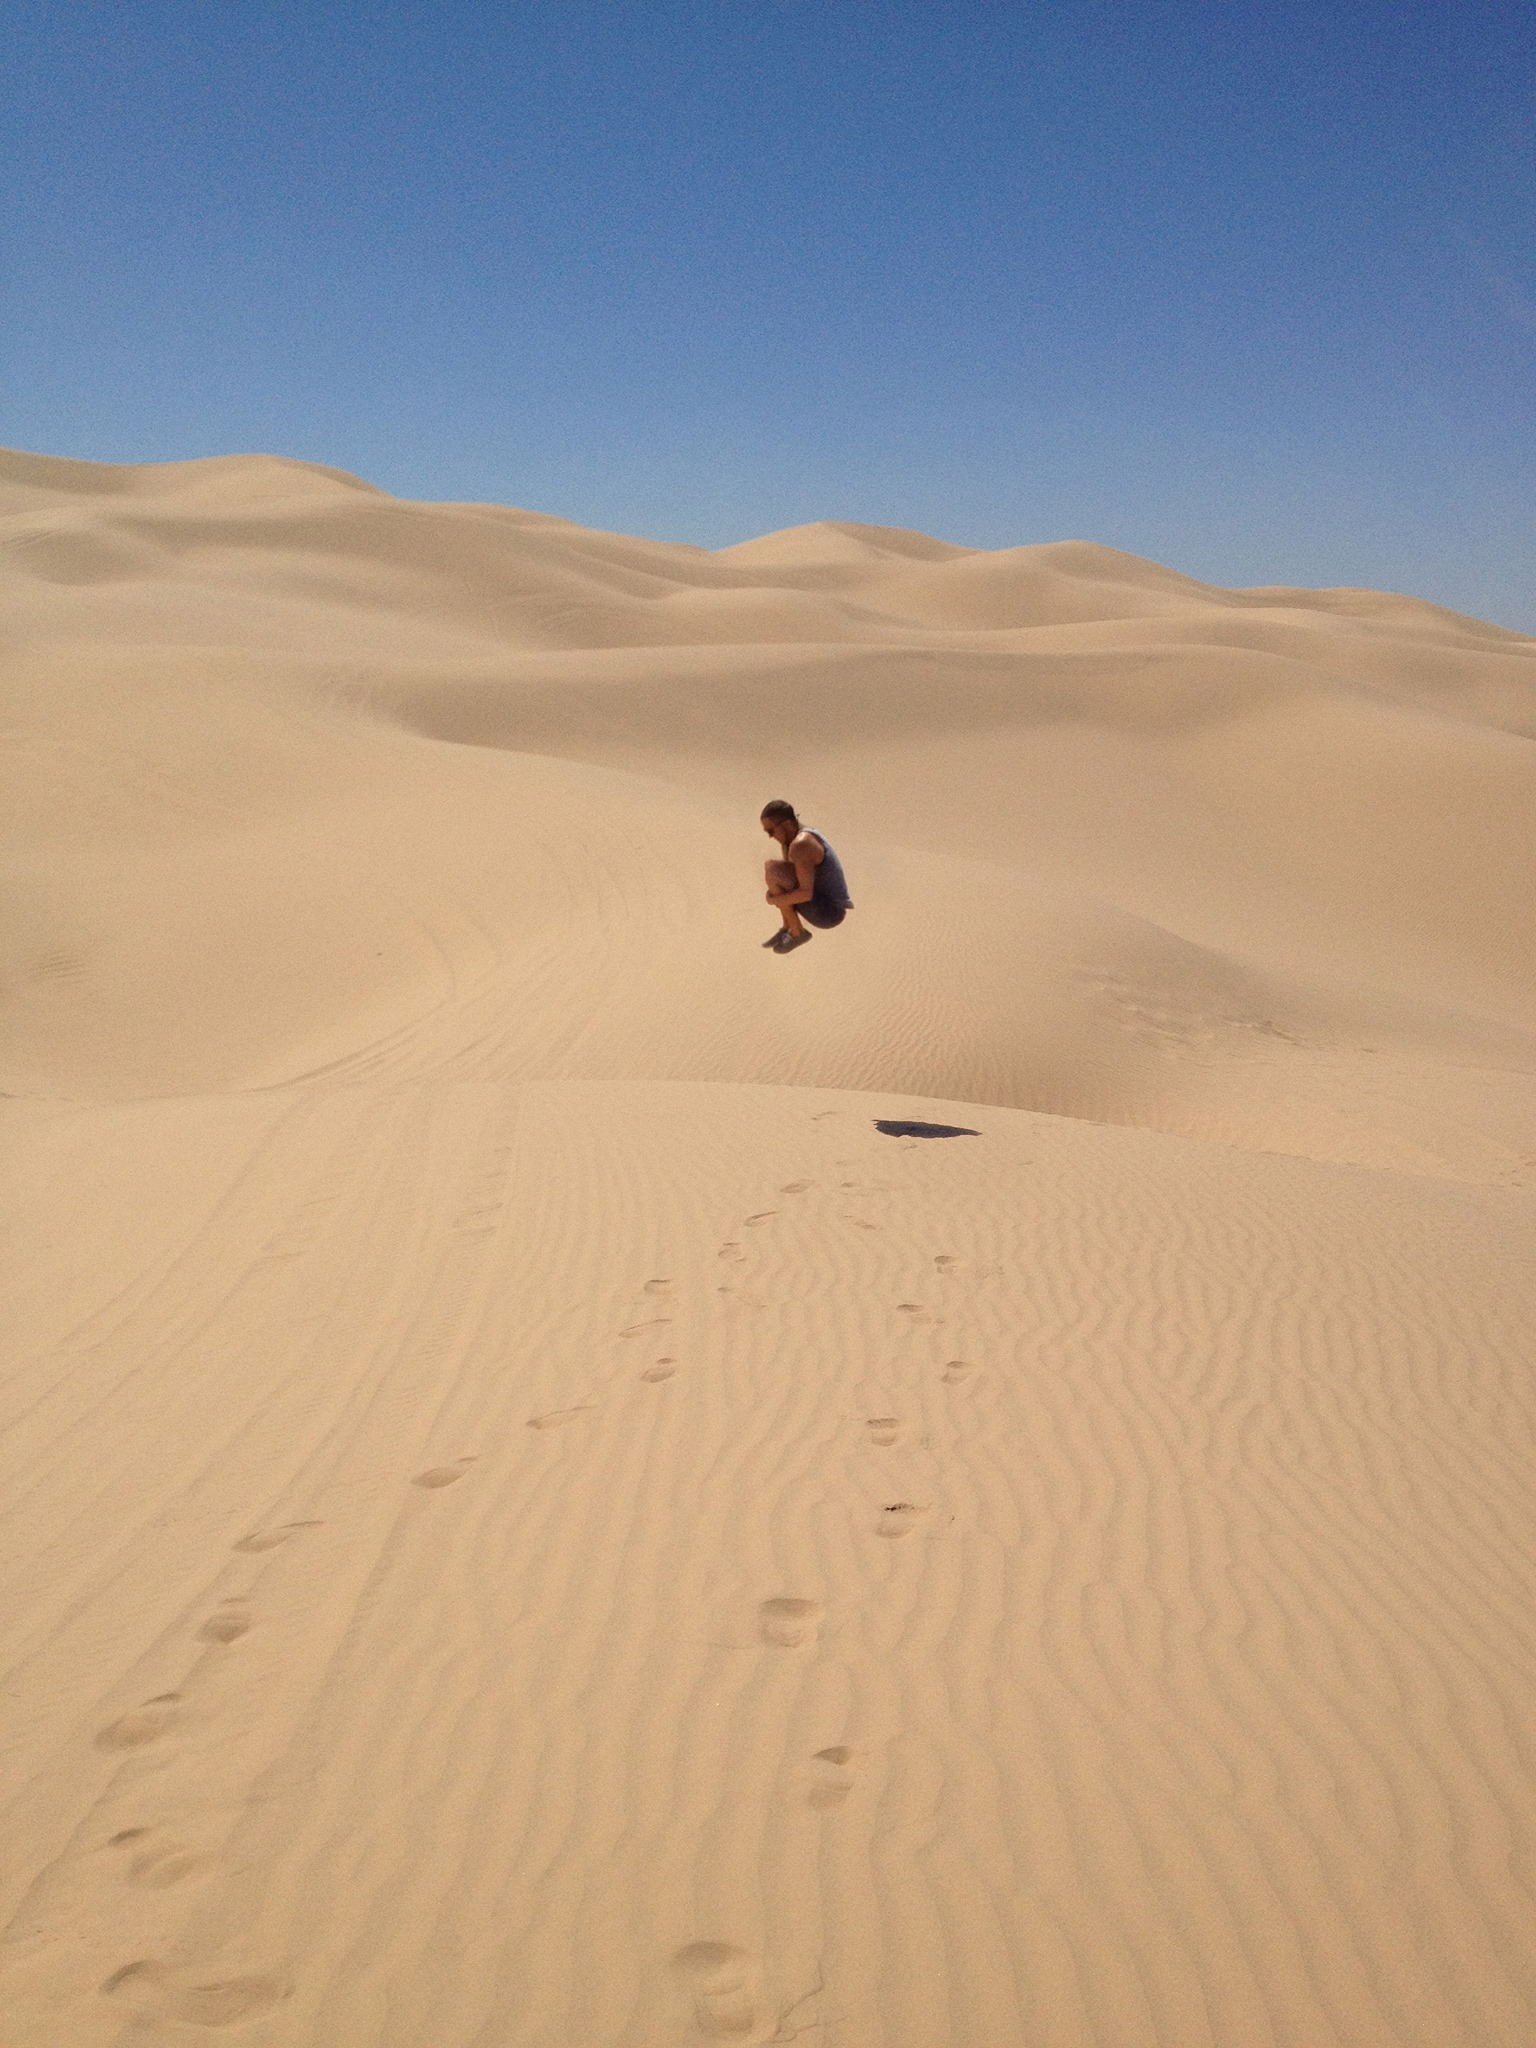 Yuma Desert (Tatooine in parts of original Star Wars trilogy)